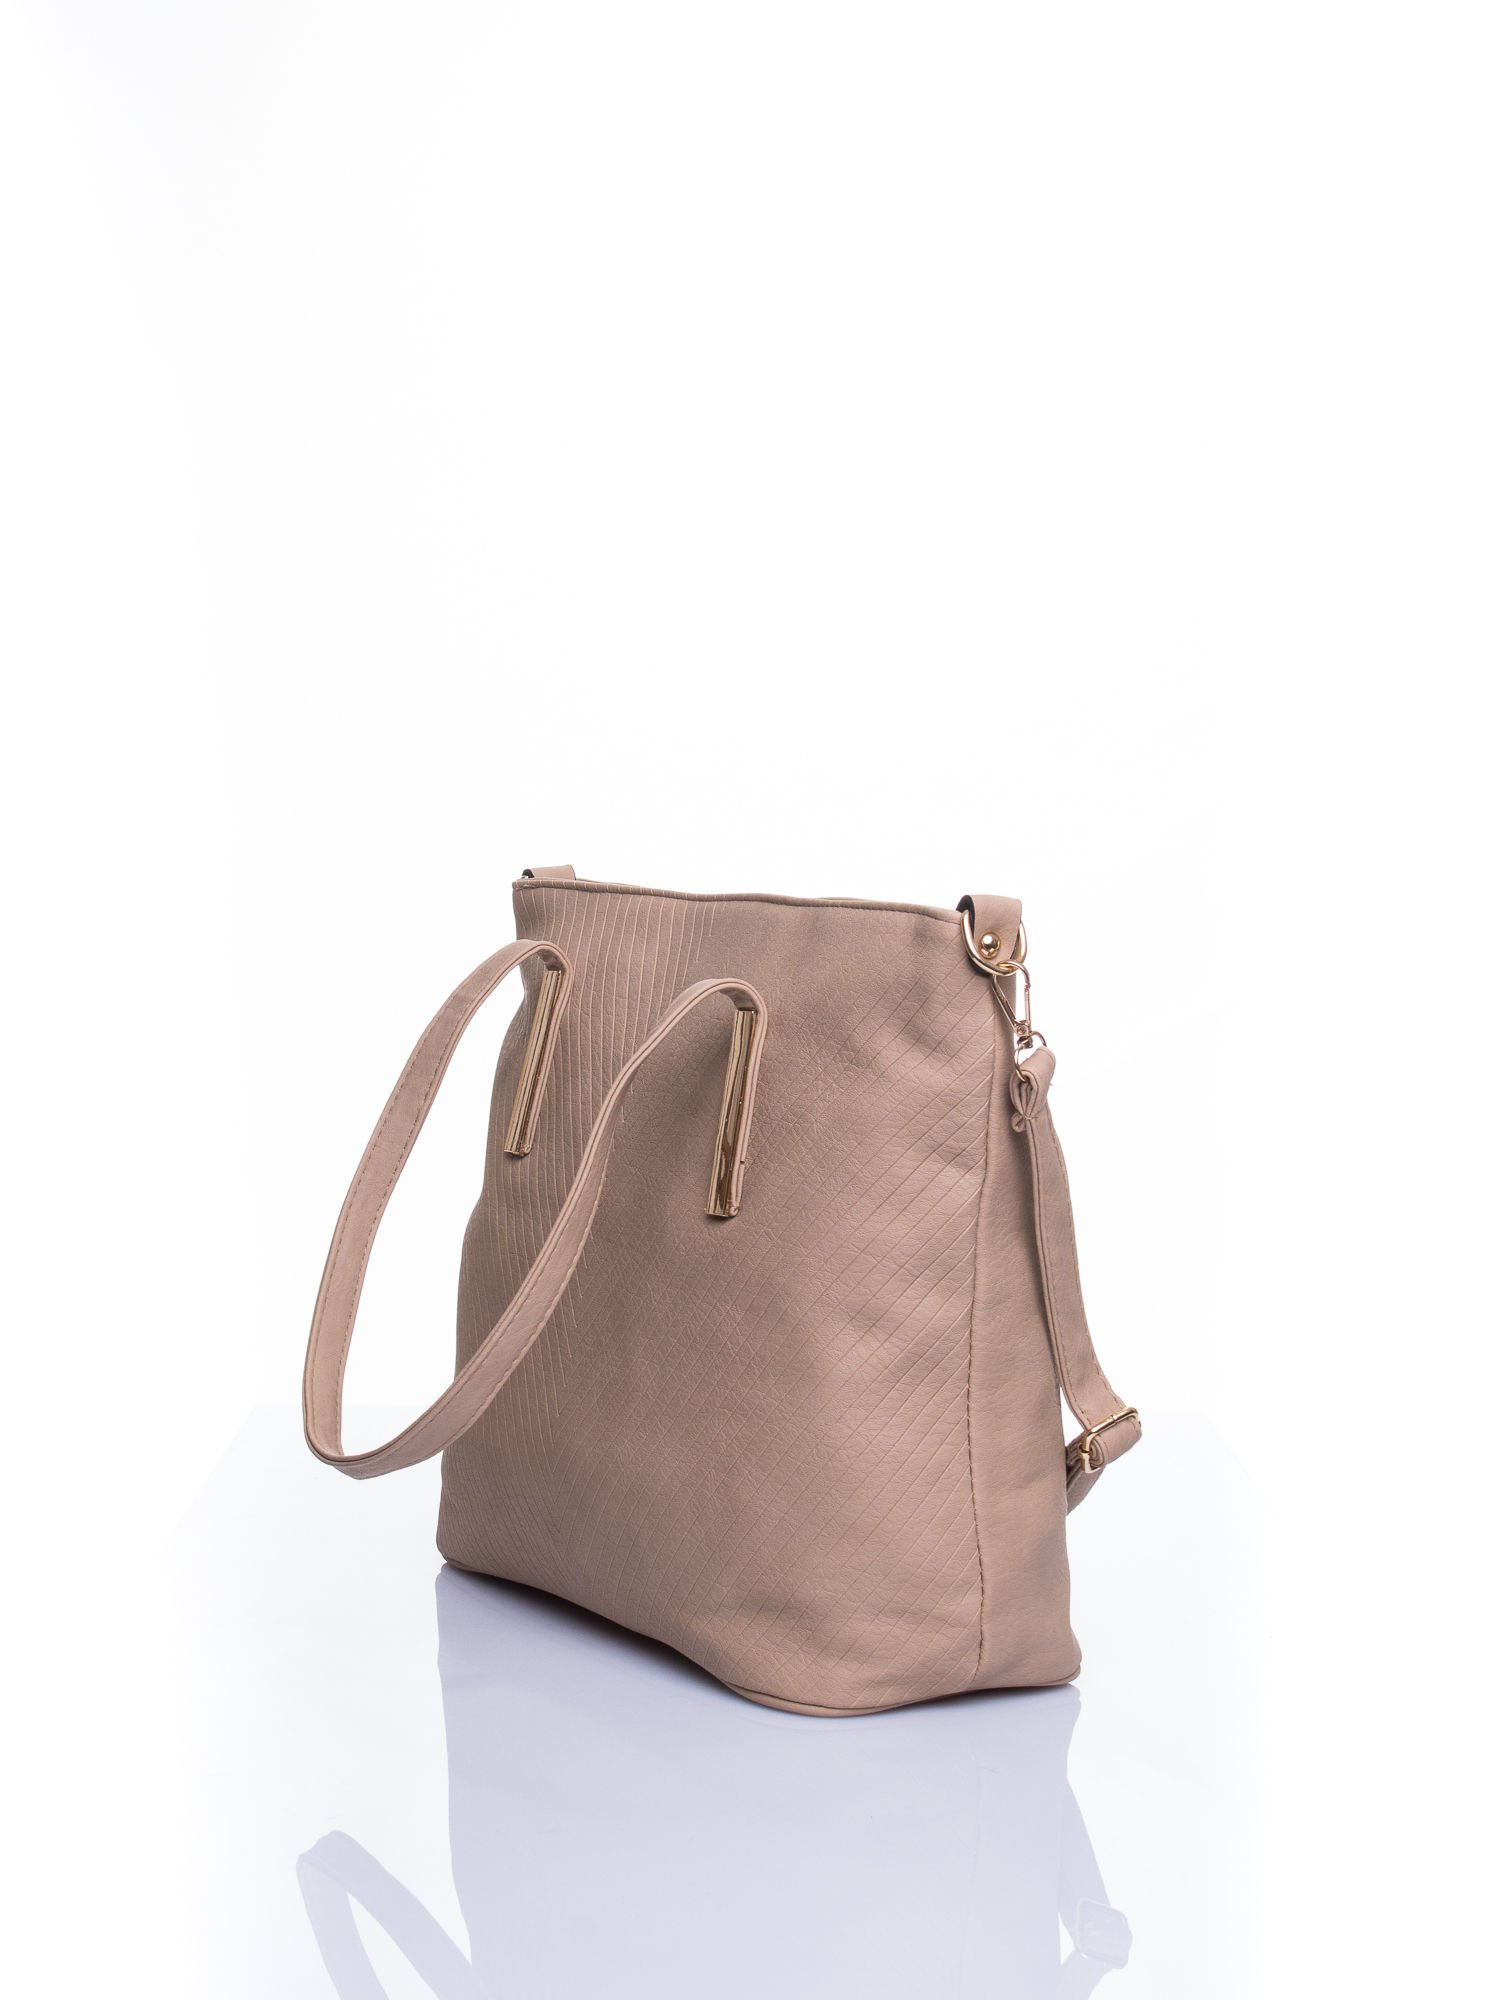 Beżowa fakturowana torba shopper bag                                  zdj.                                  4